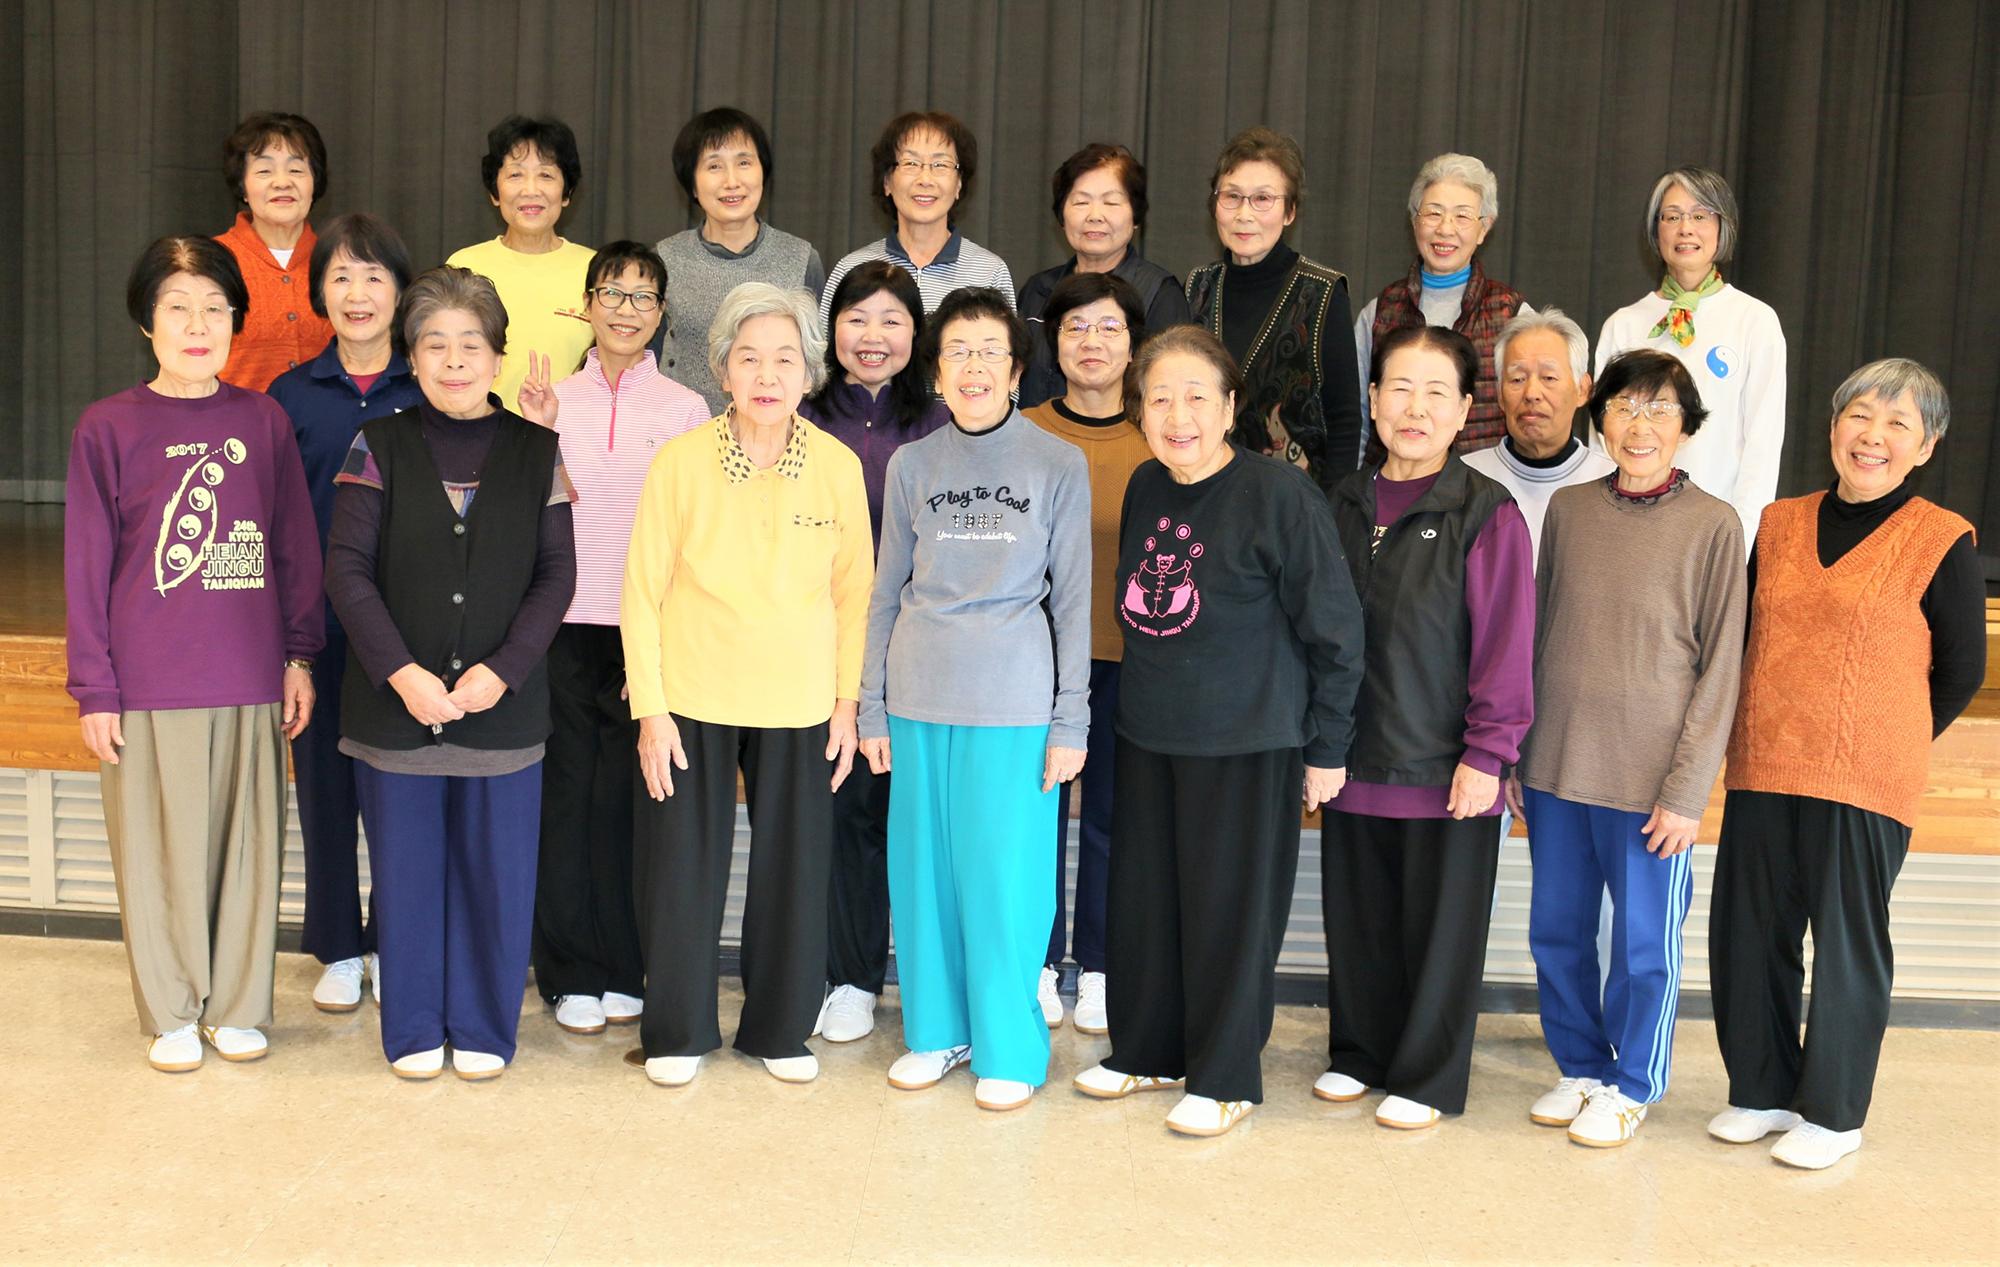 八幡泉講師と笠岡中公民館